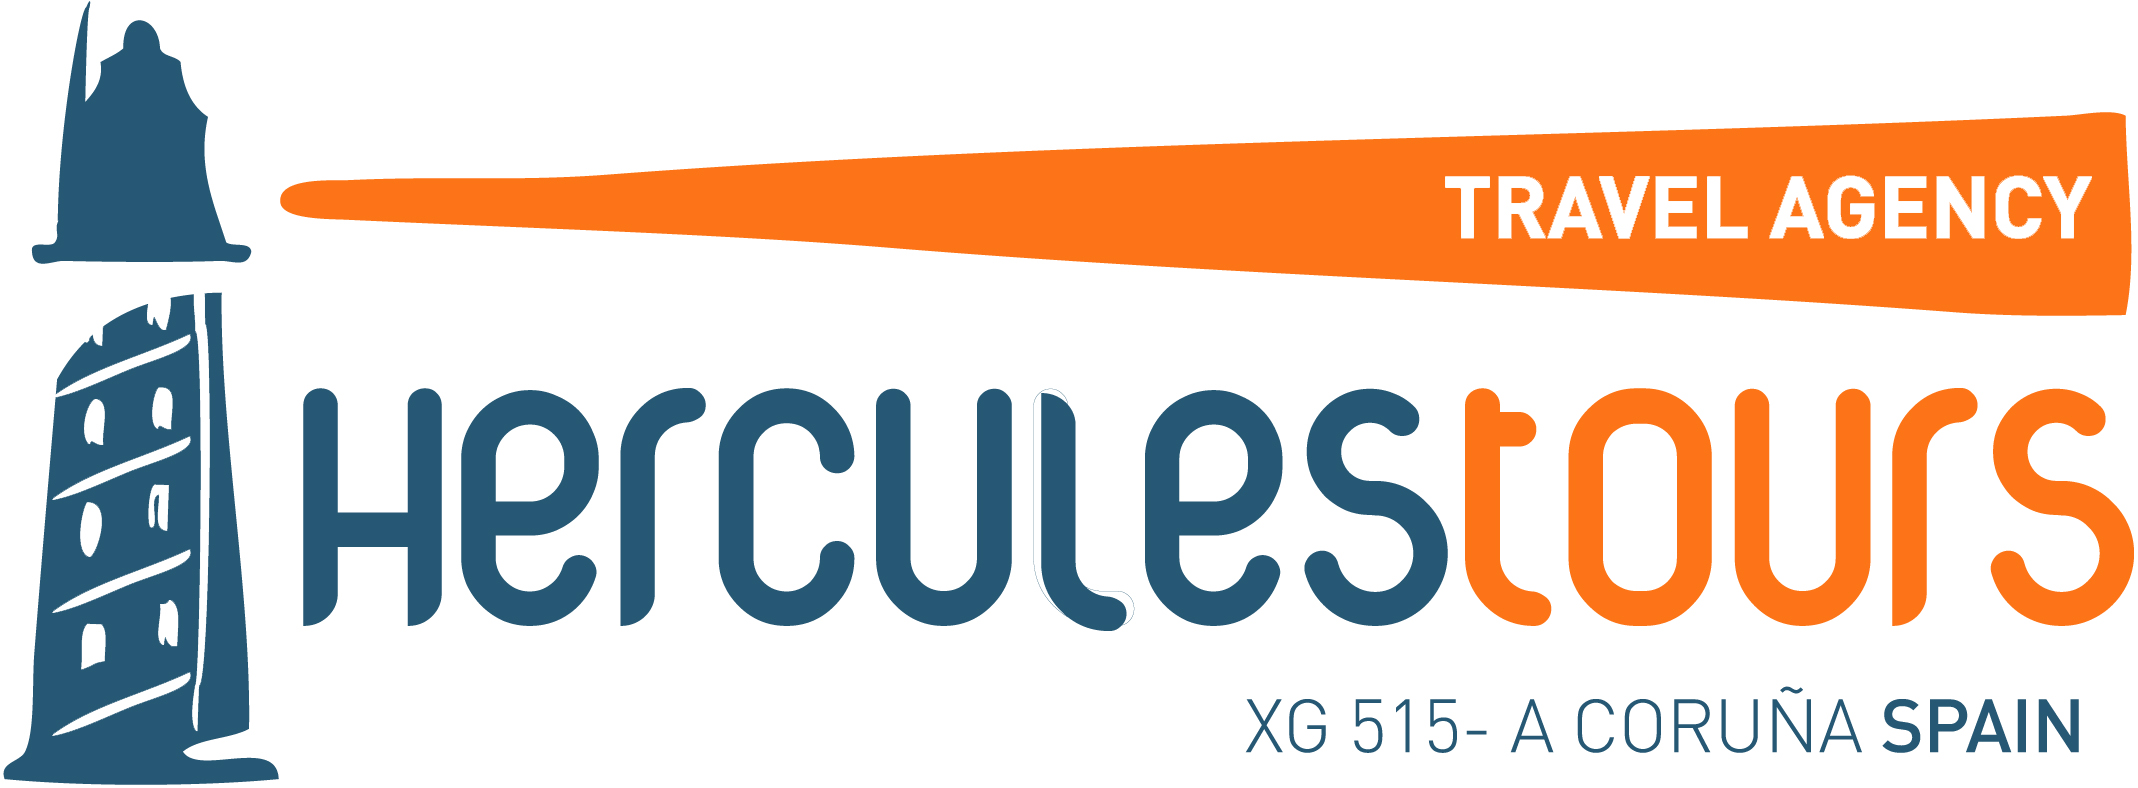 Hercules Tours